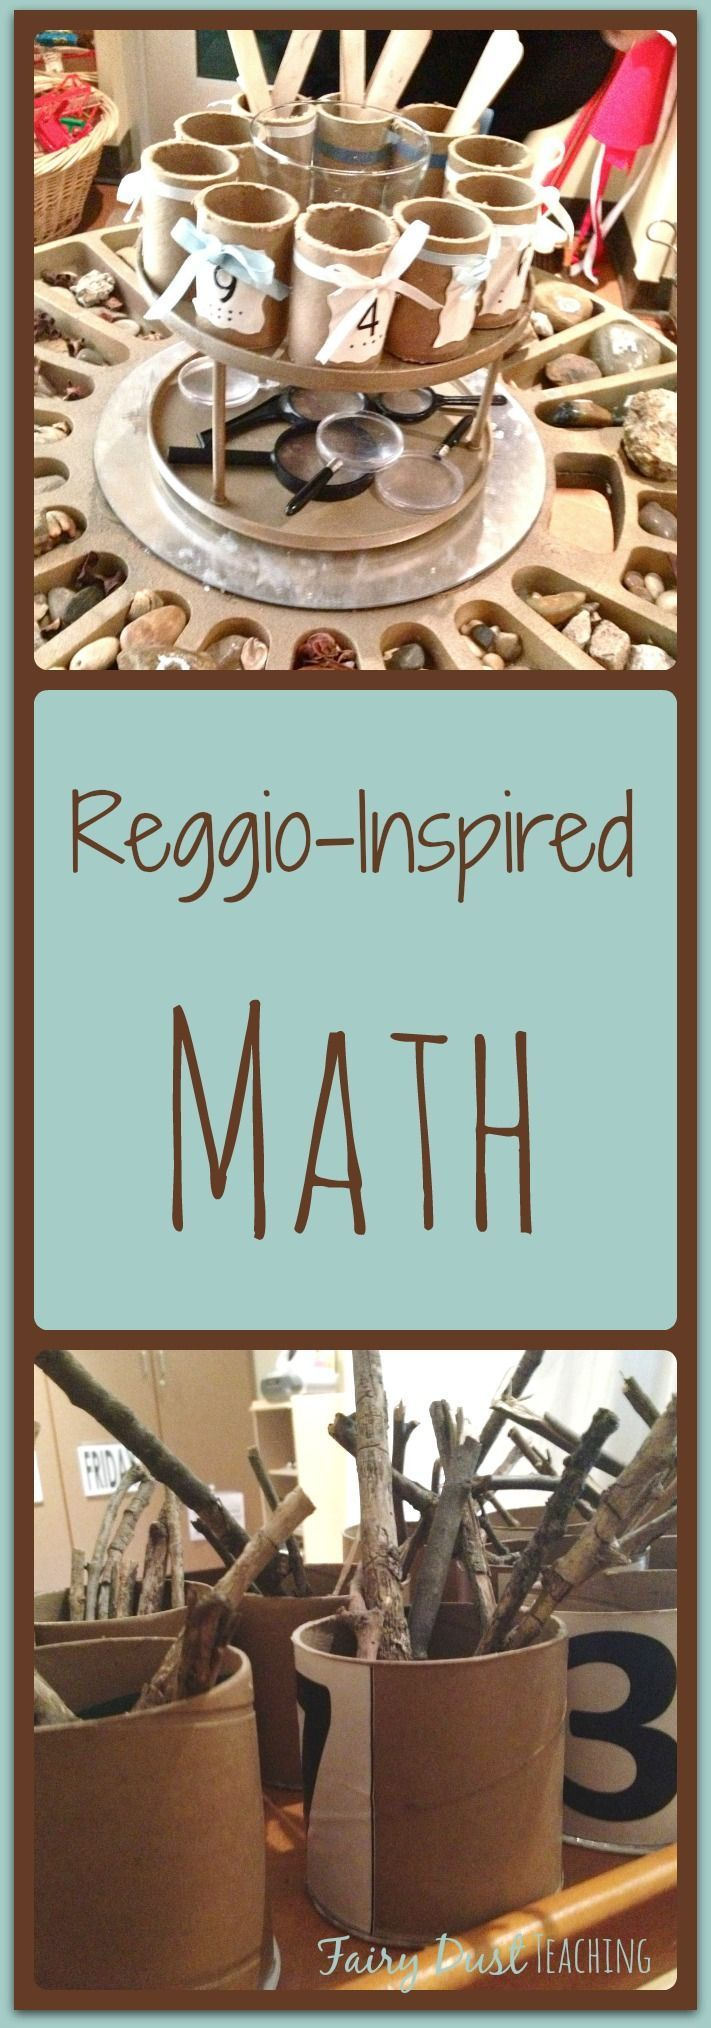 83 best School project images on Pinterest | Preschool, Art crafts ...